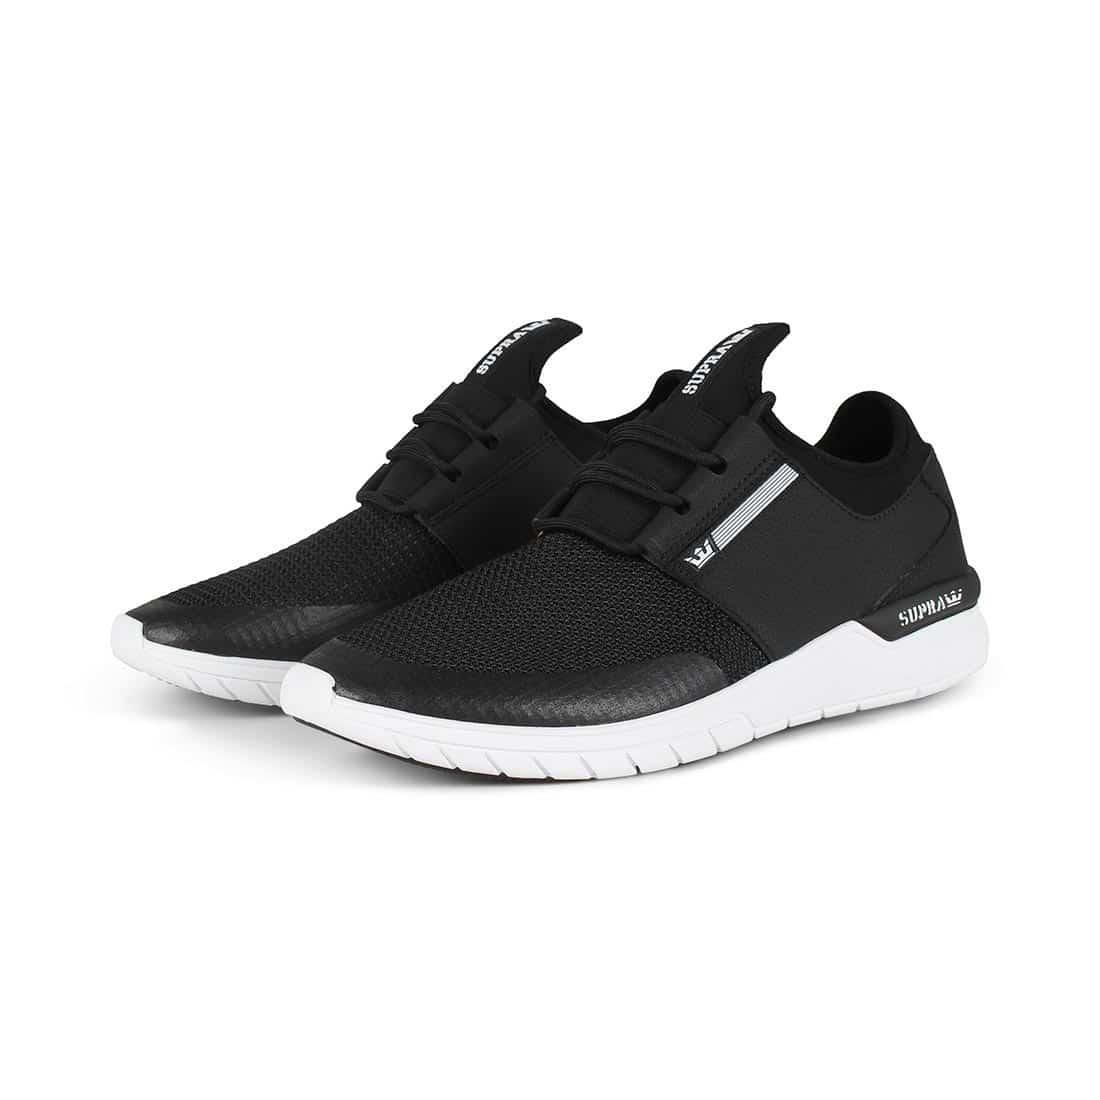 Supra Flow Run Shoes - Black / Black / White